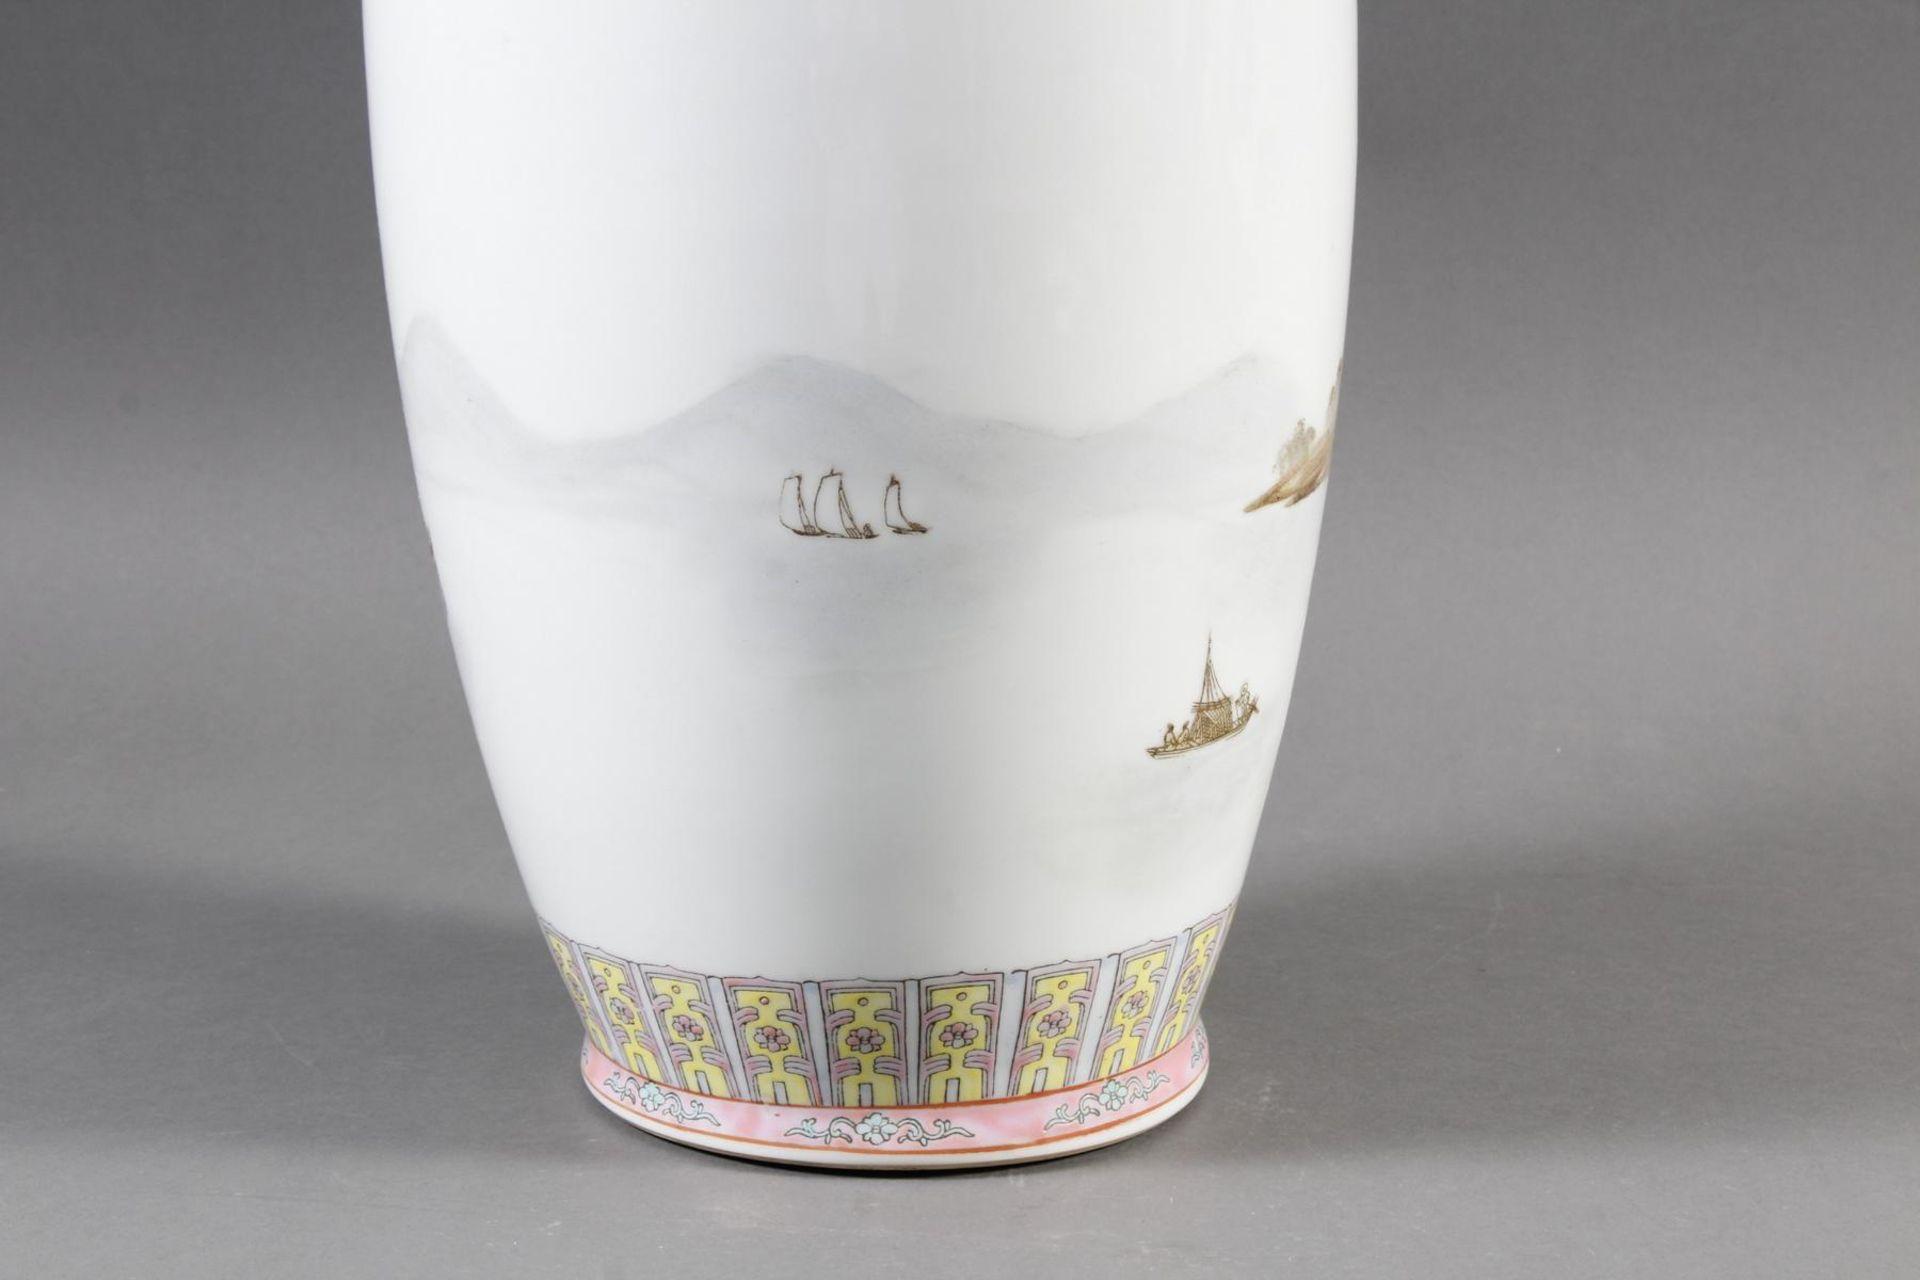 Porzellan Bodenvase, China 20. Jahrhundert - Bild 5 aus 12